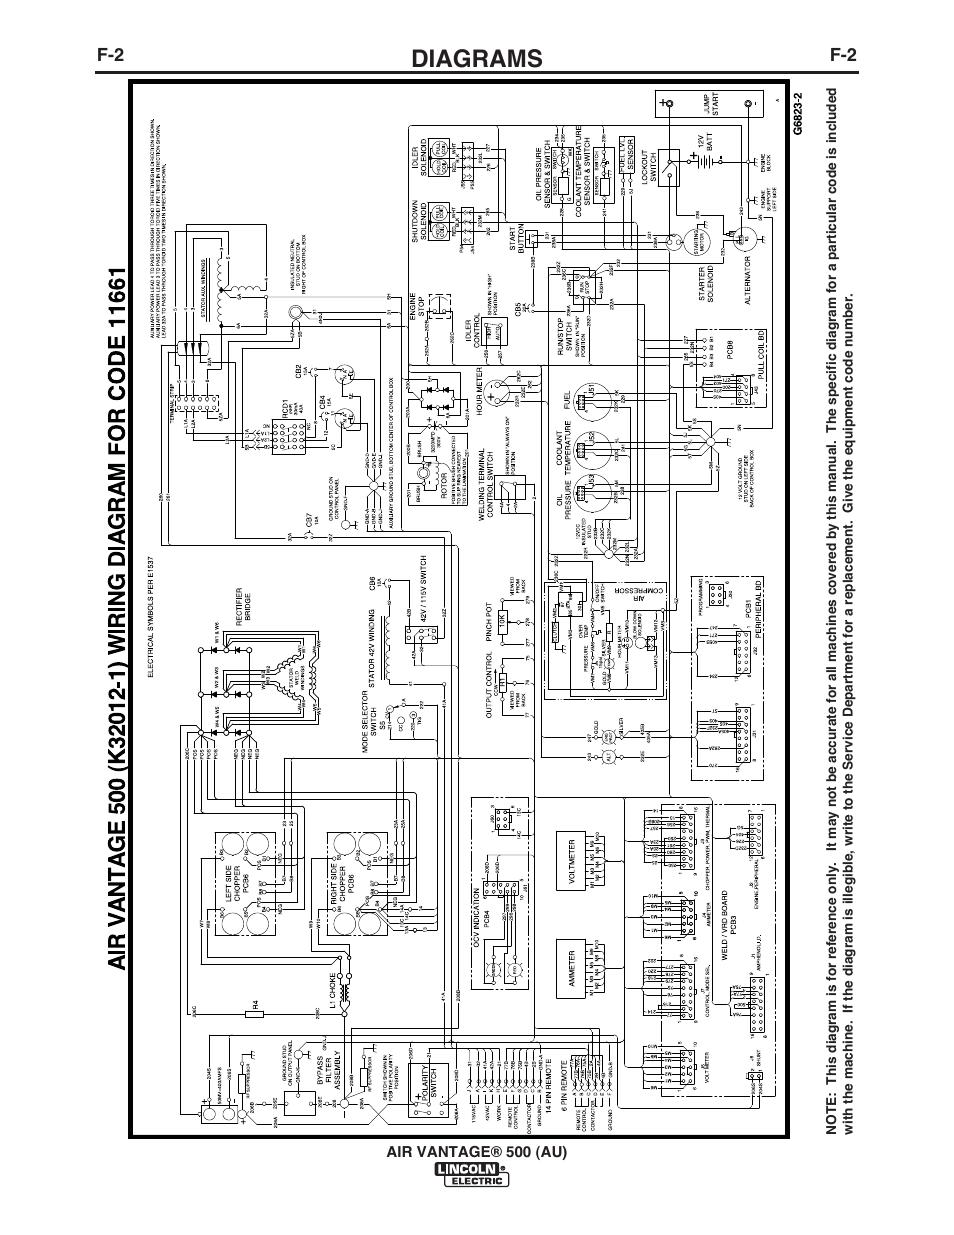 Lincoln 6 Pin Wiring Diagram : 3 Way Switch Wiring 6 Pin